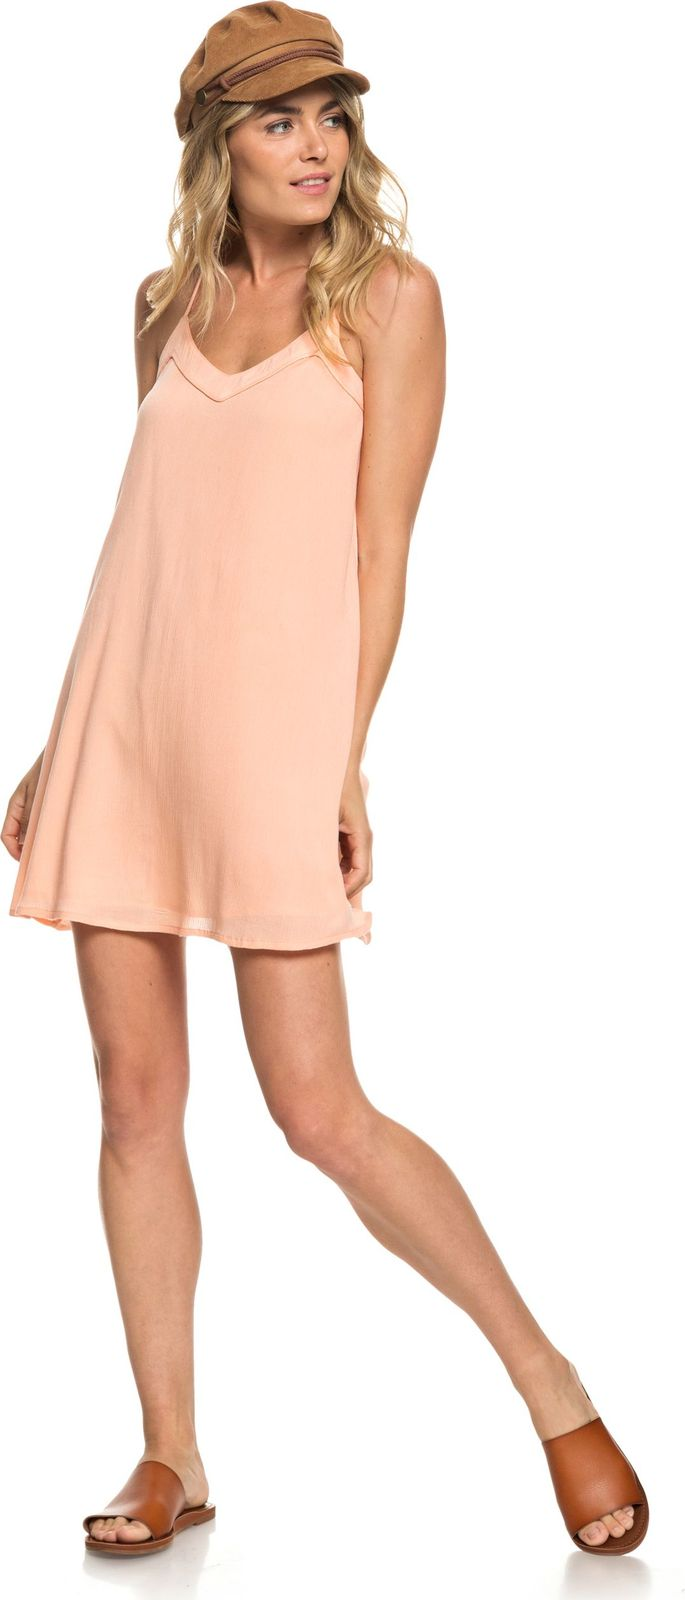 Сарафан Roxy Off We Go Dress off the shoulder mini dress in khaki